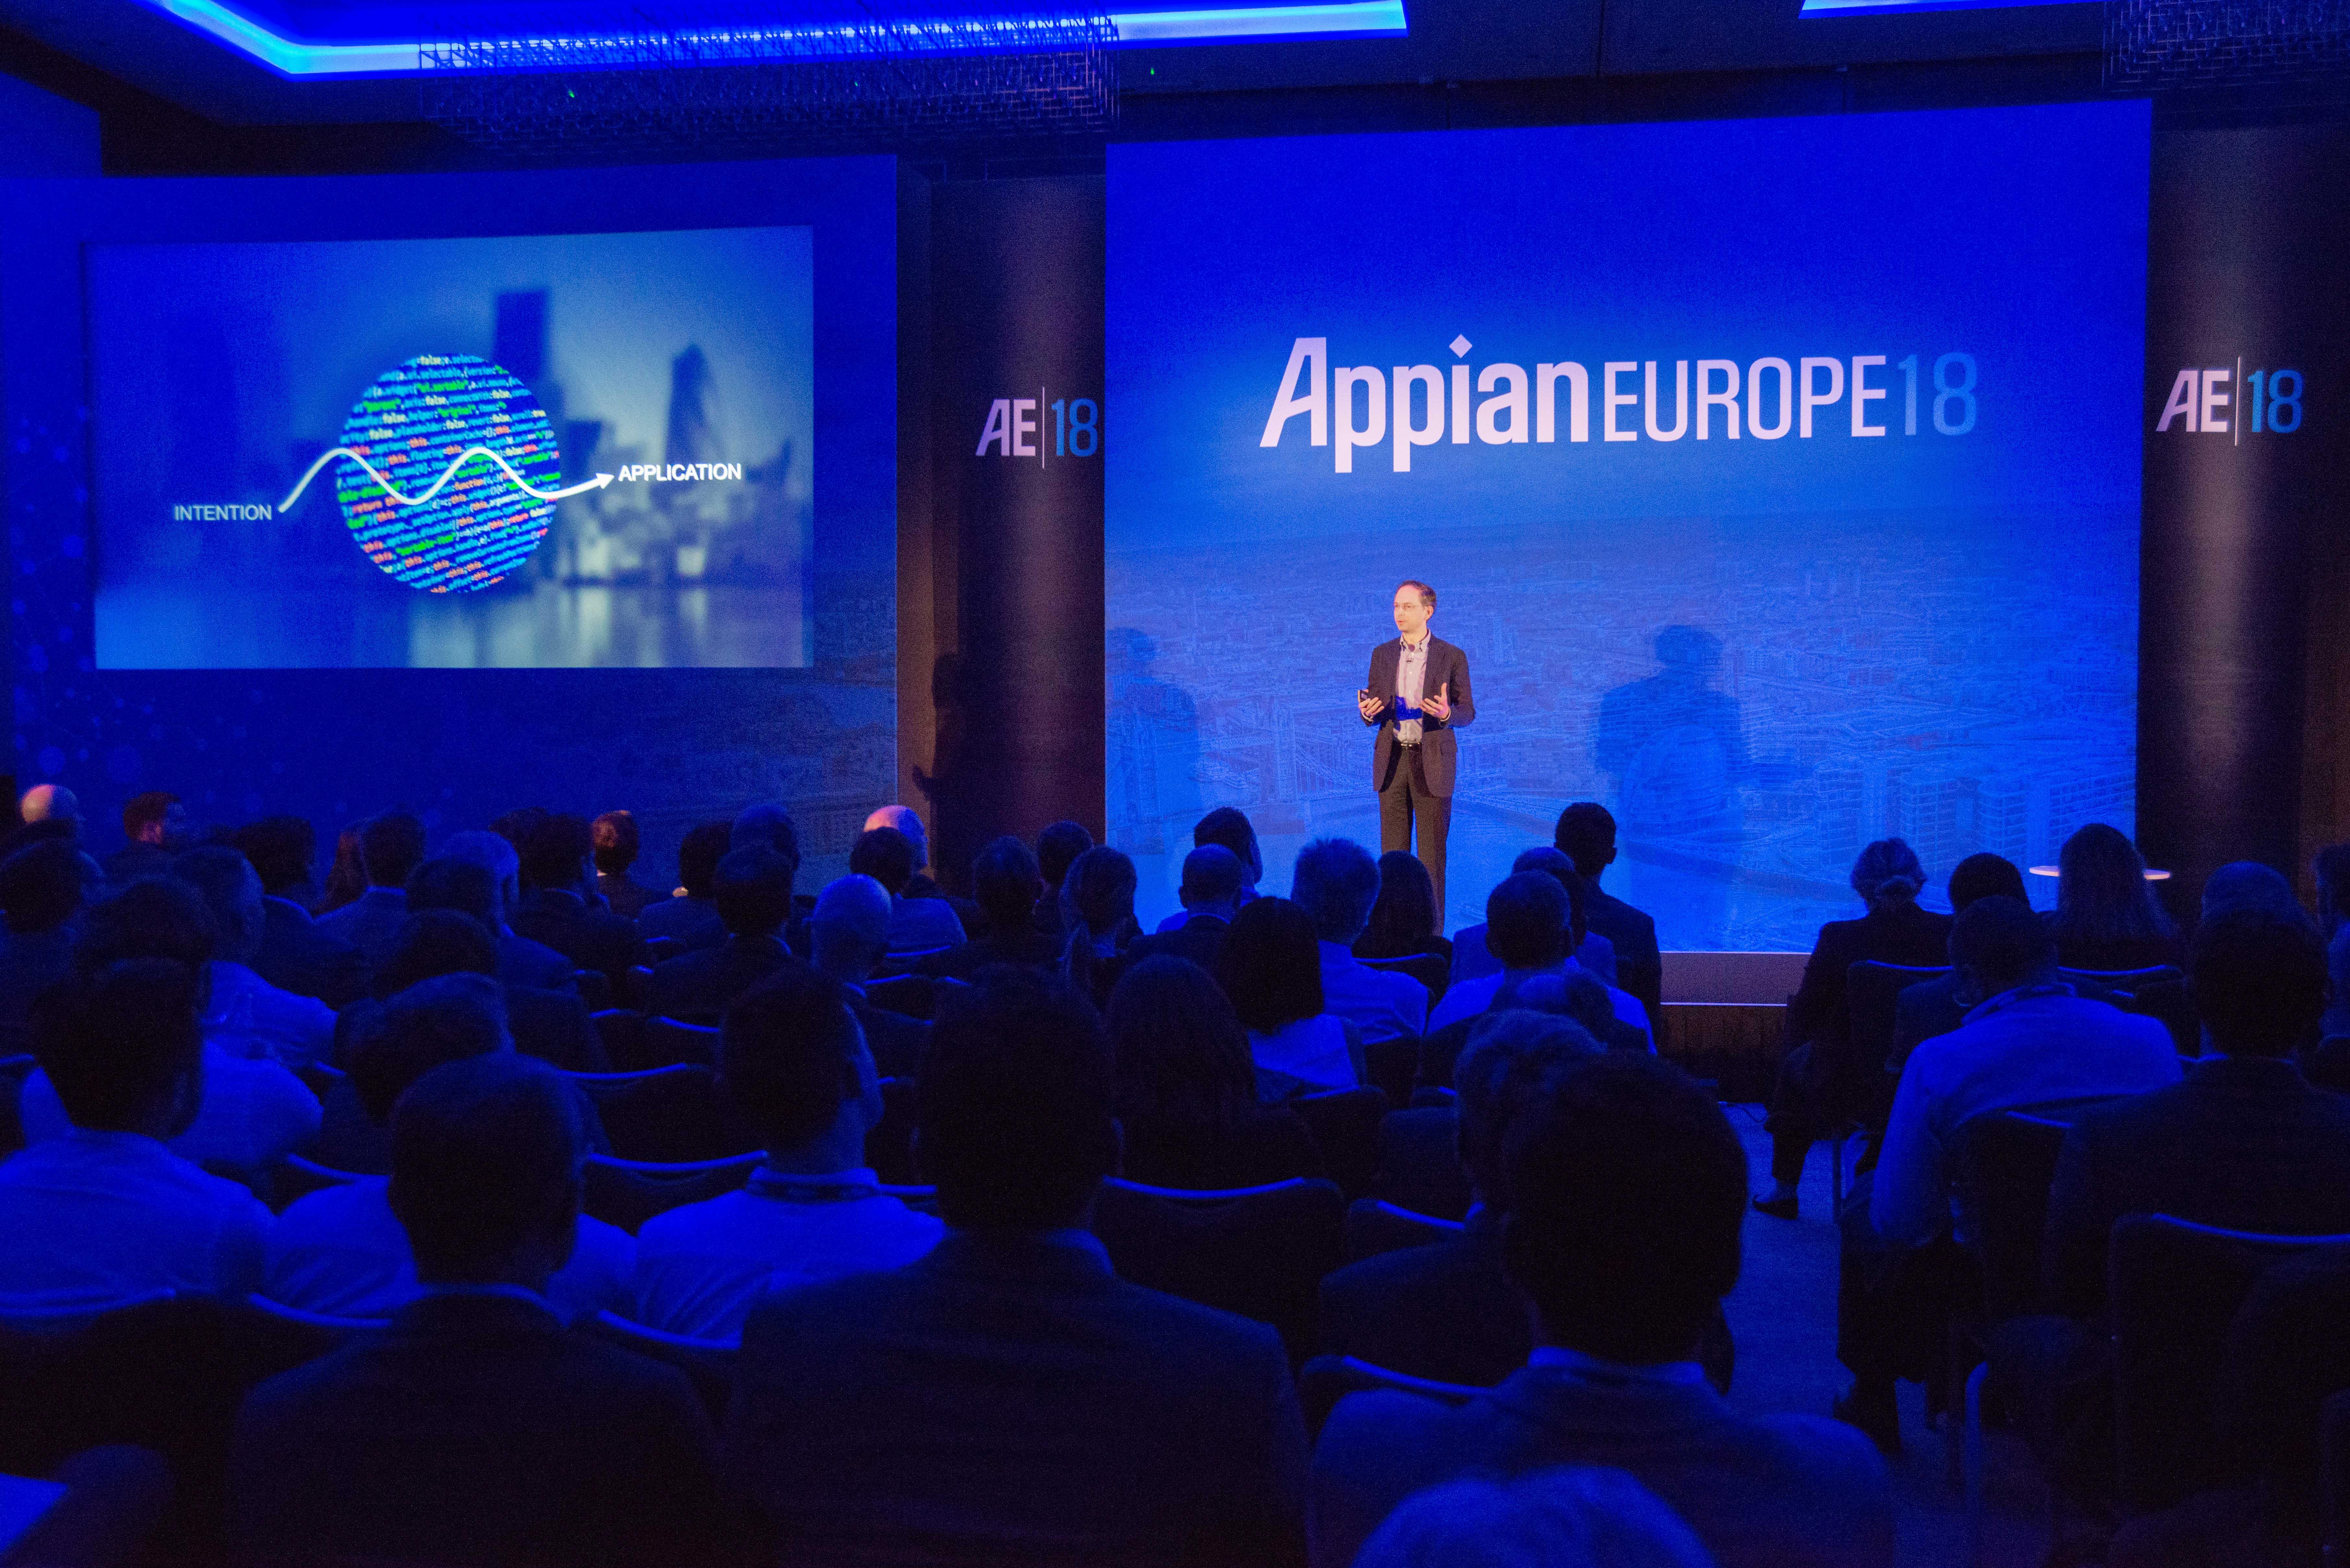 Appian Europe 2018 Matt Calkins Keynote